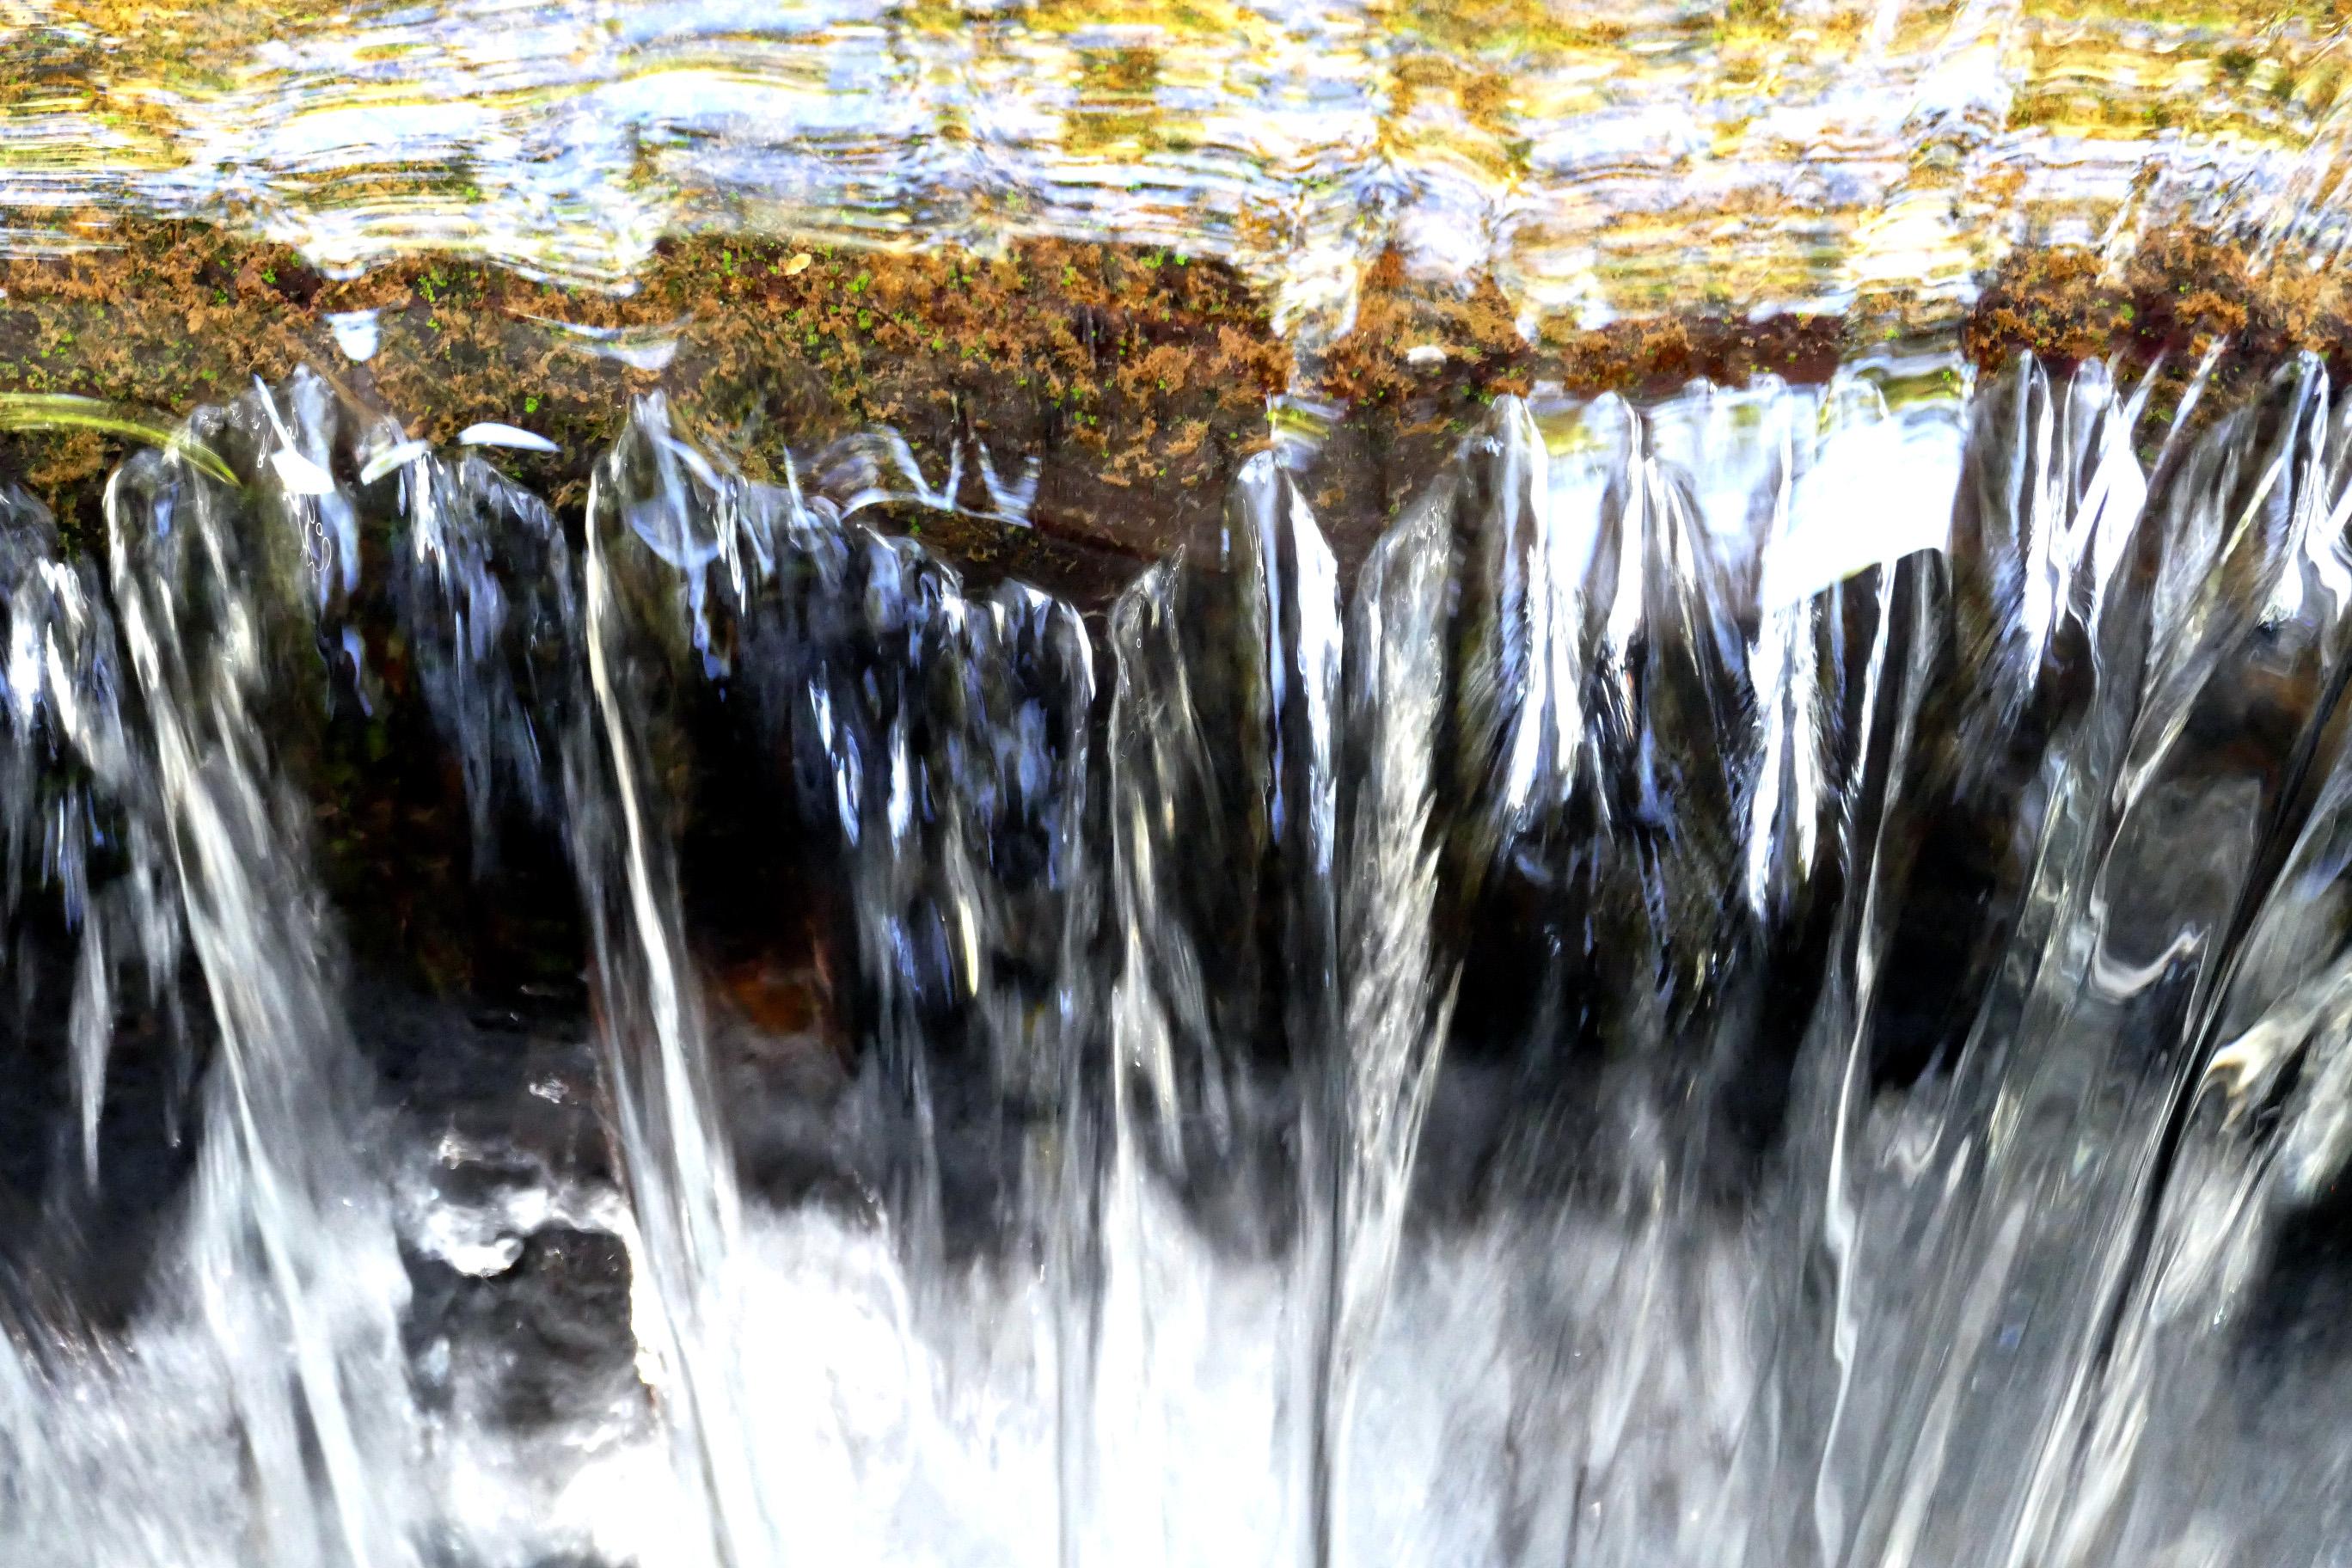 Técnicos discutem formas de cuidar da água